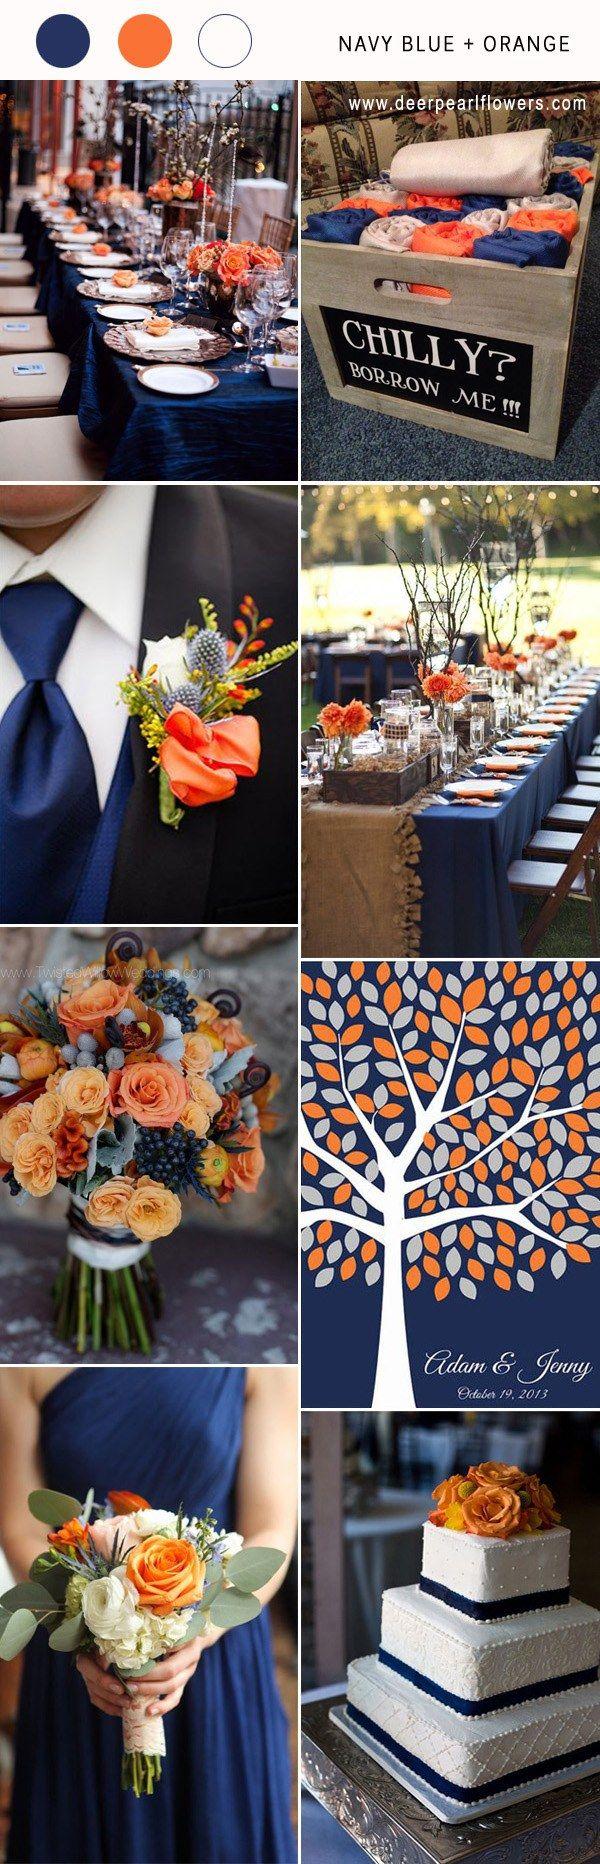 Wedding decorations reception october 2018  best My Future Wedding images on Pinterest  Engagements